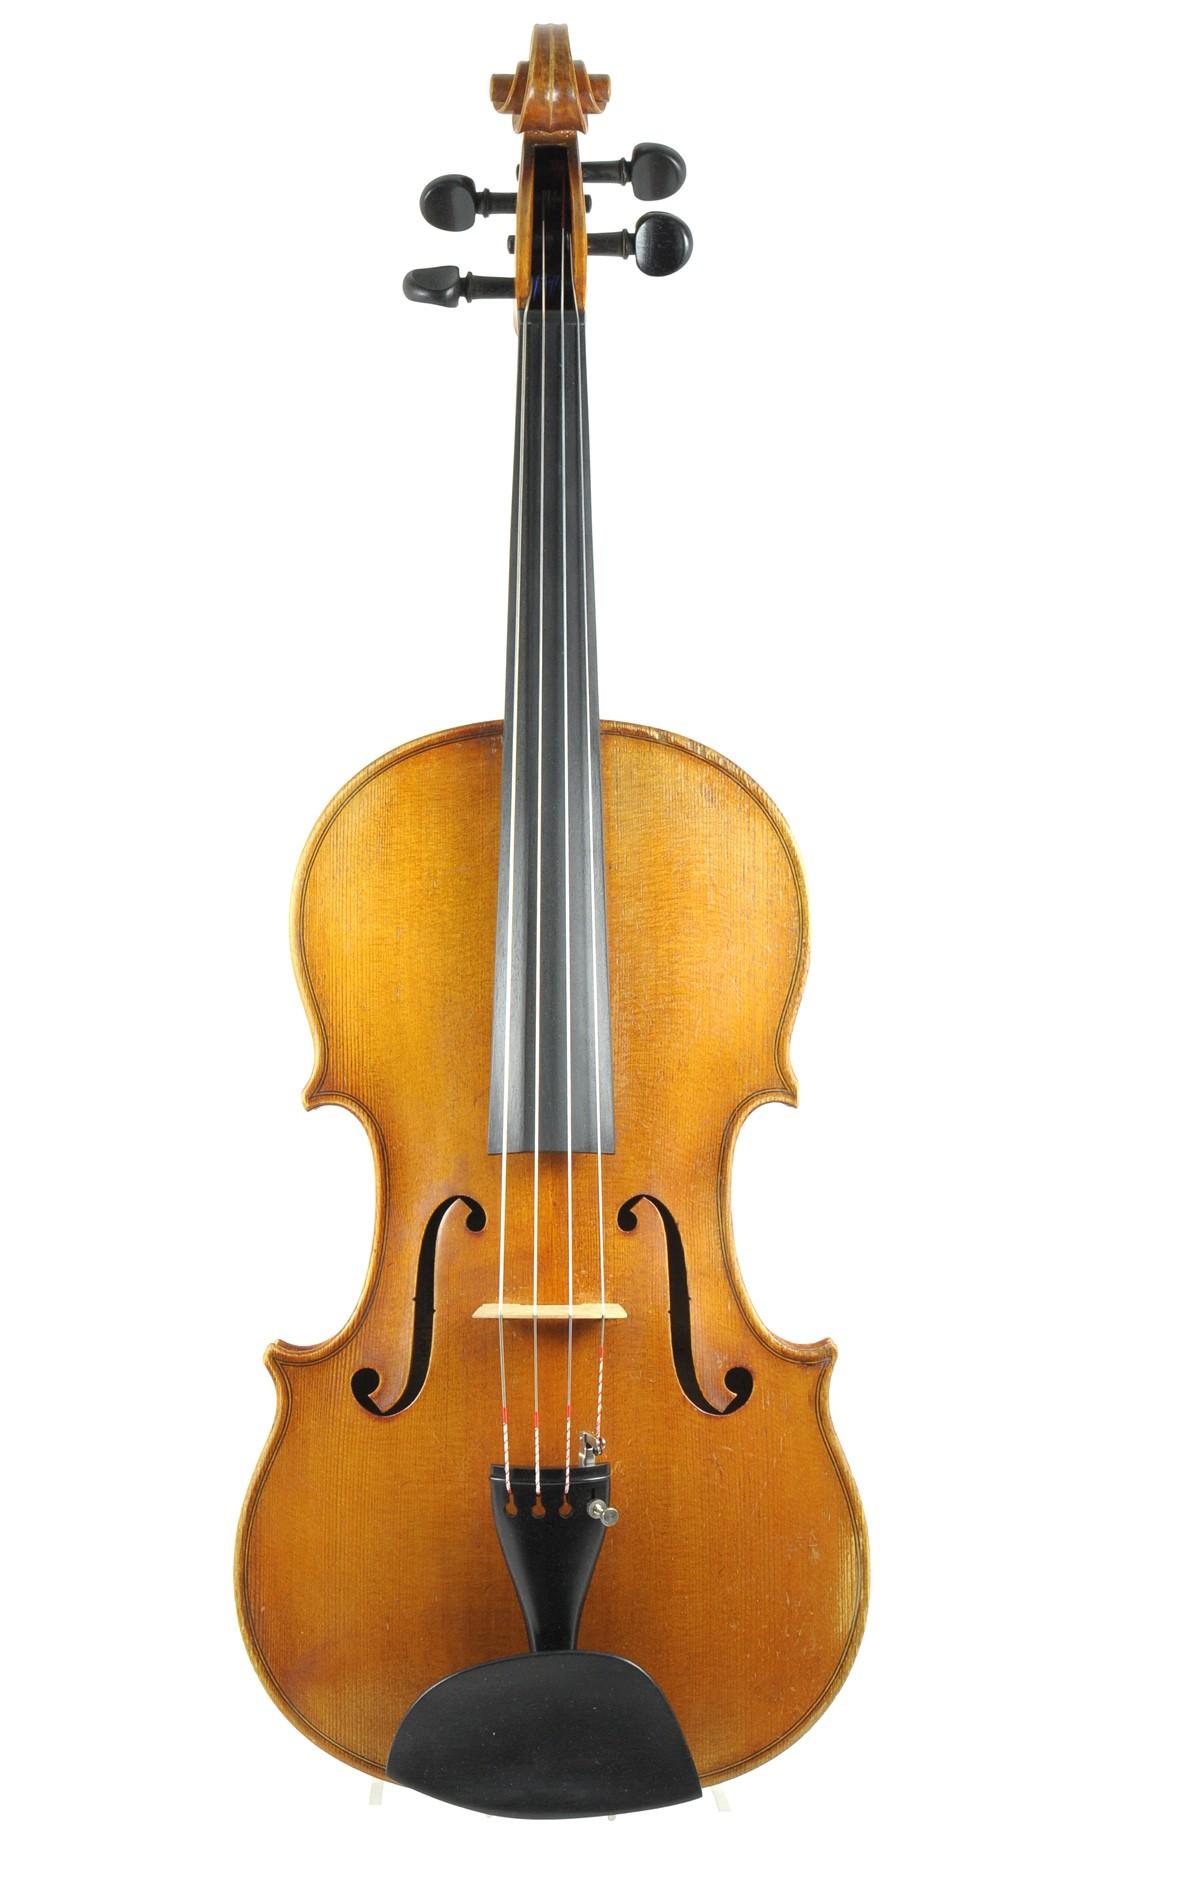 Ottomar Hausmann, viola, Mittenwald ca. 1950 - top